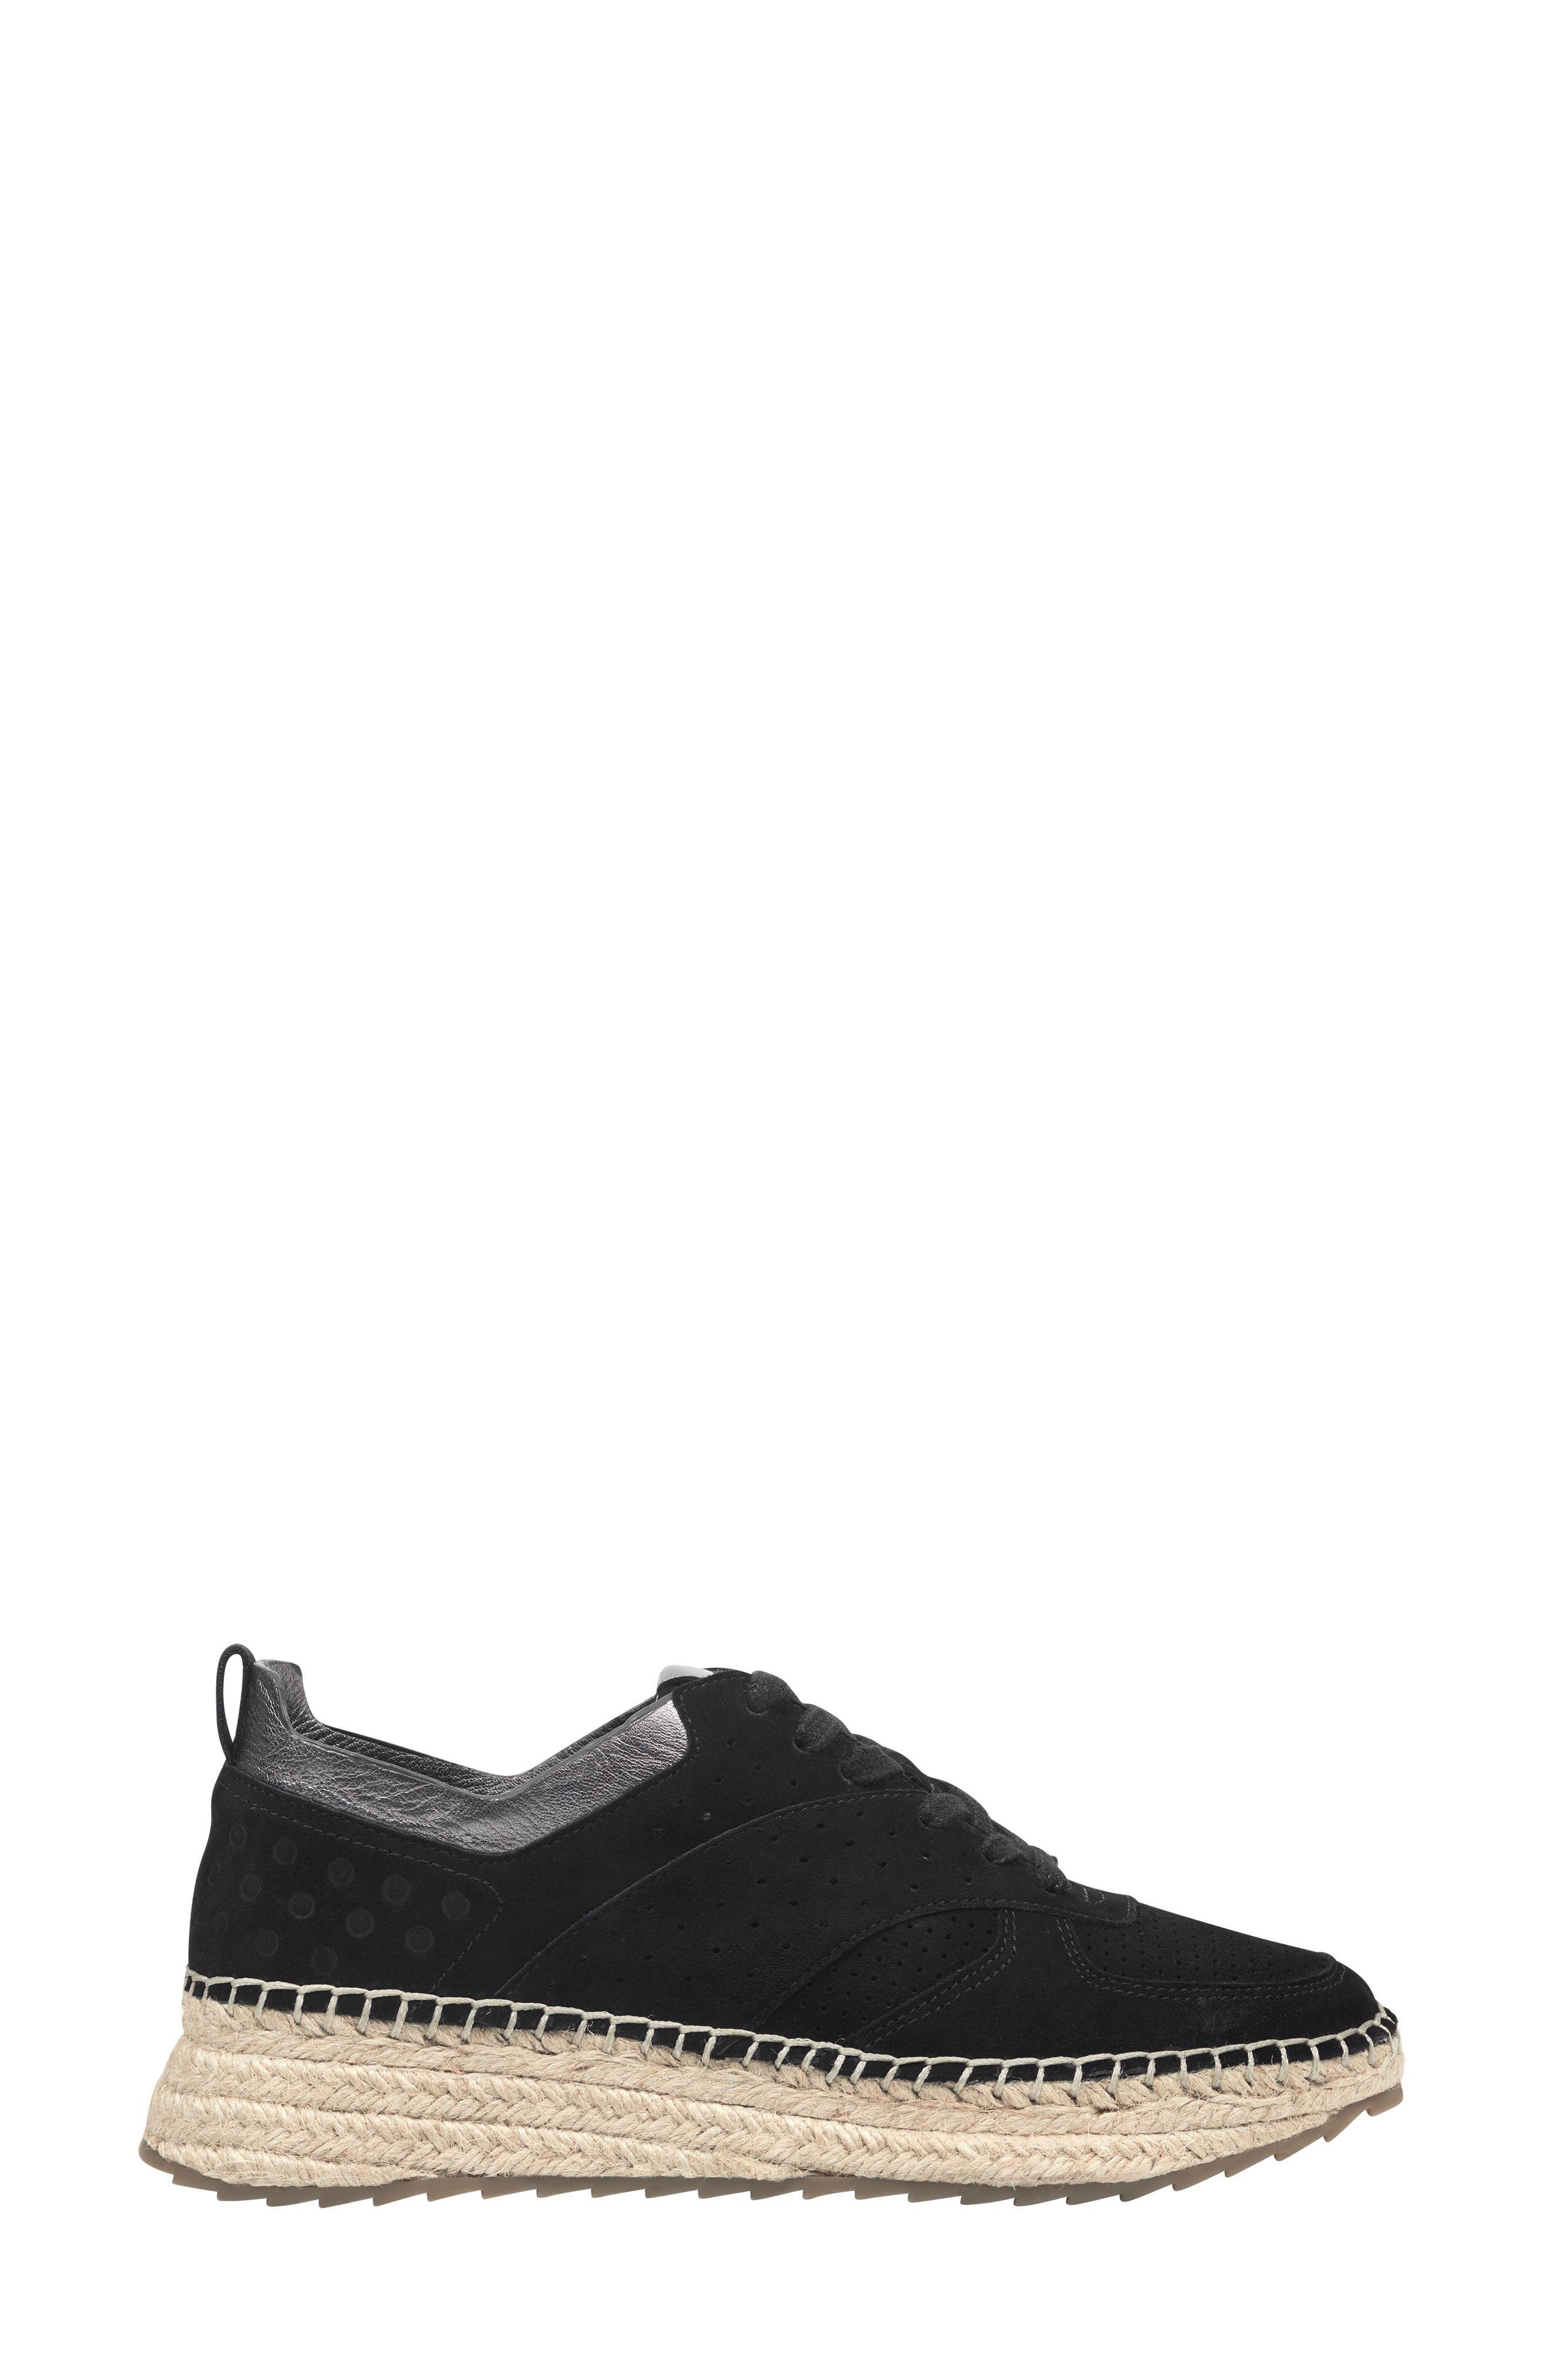 MARC FISHER LTD, Julio Sneaker, Alternate thumbnail 3, color, BLACK SUEDE